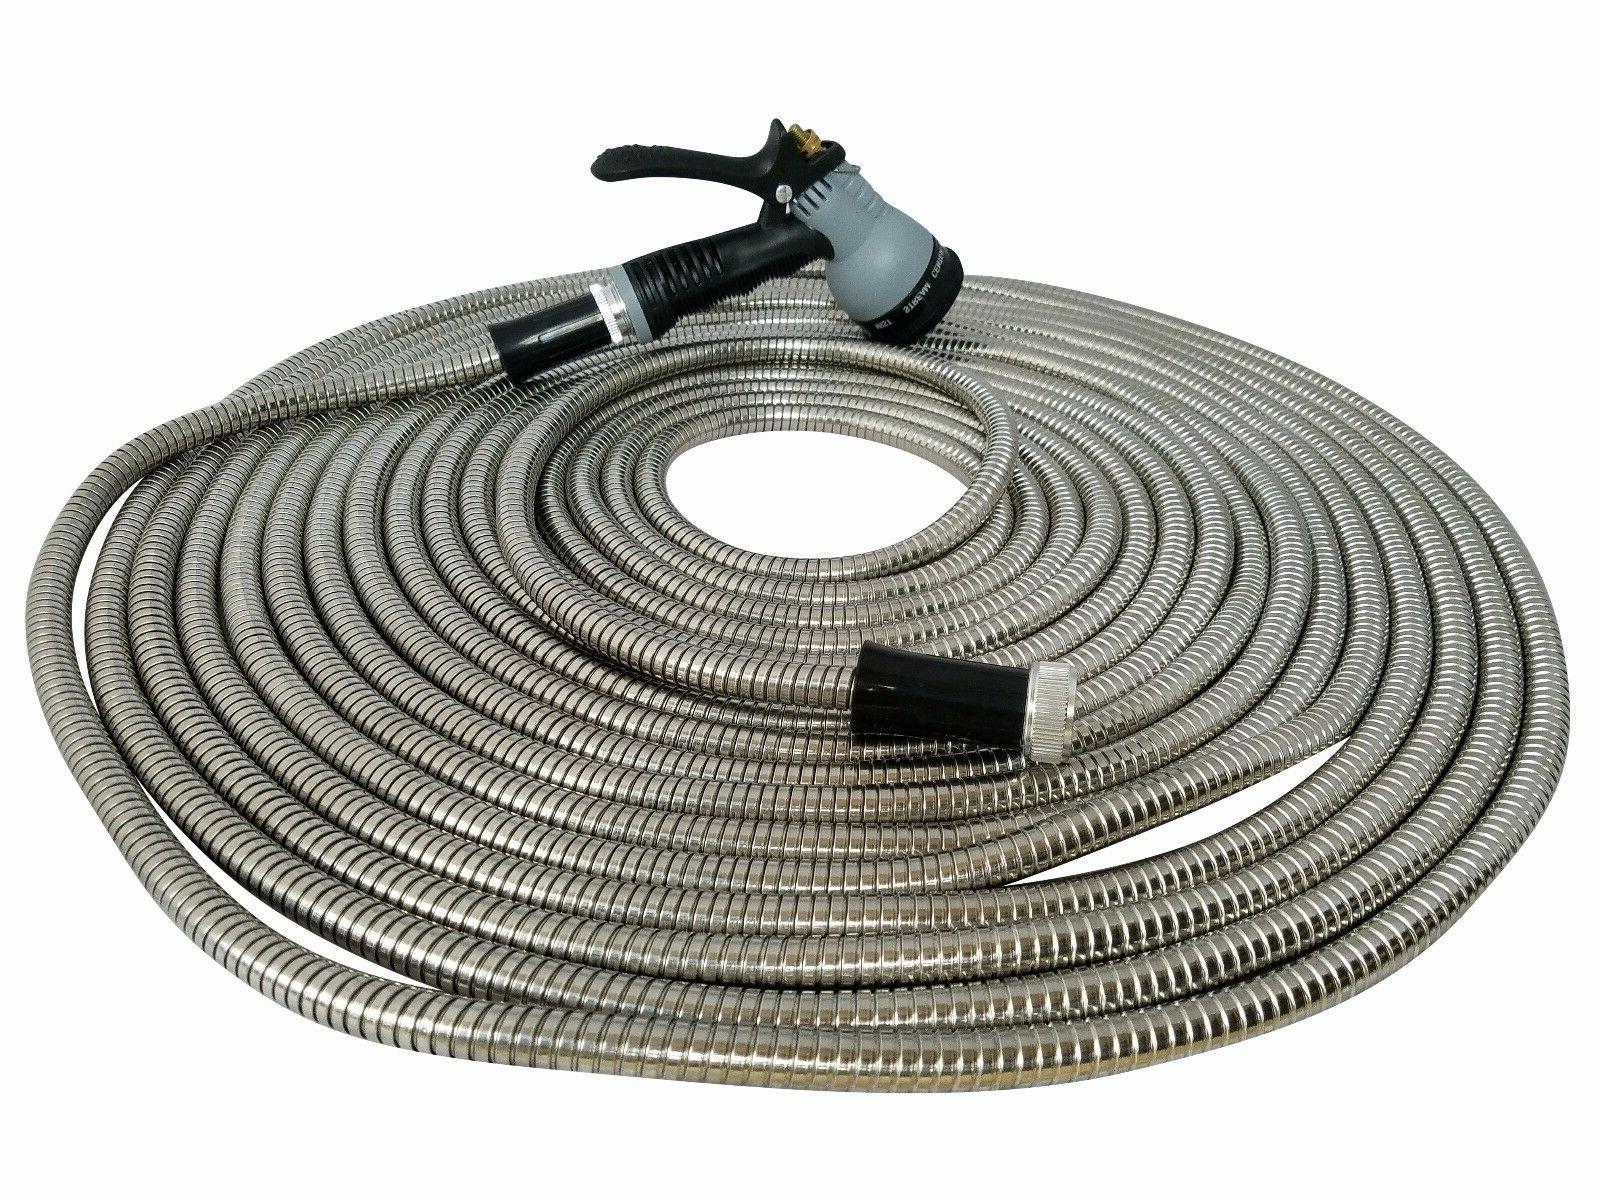 metal garden hose 50 ft stainless steel